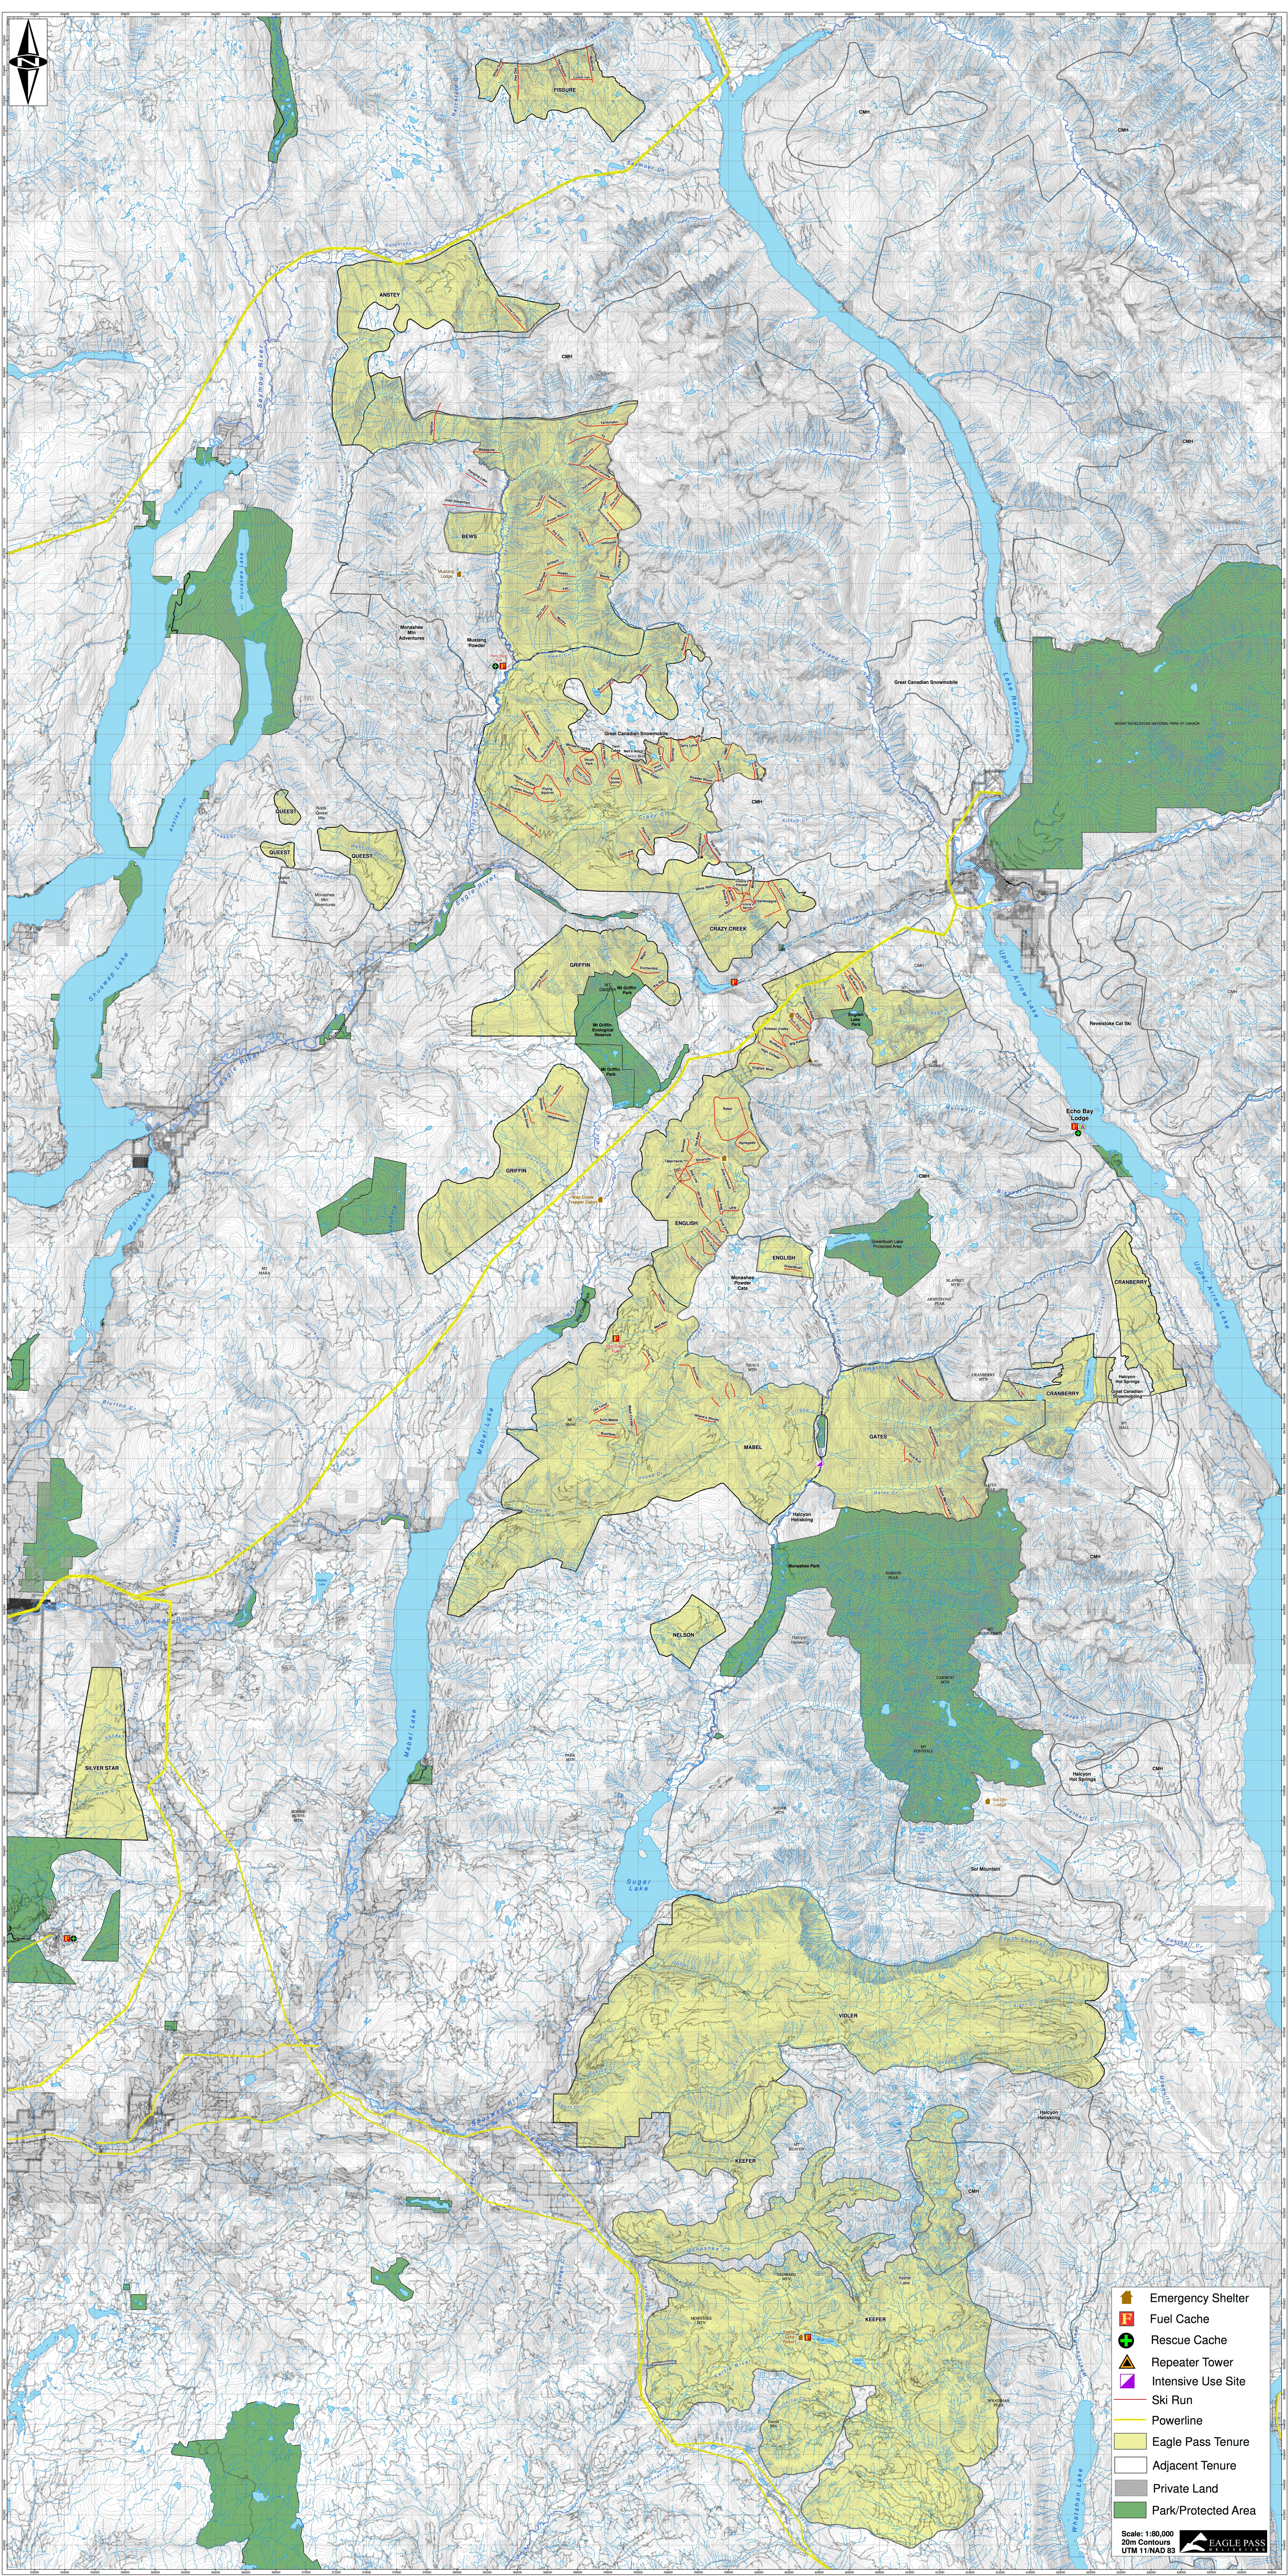 Eagle Pass Tenure Map